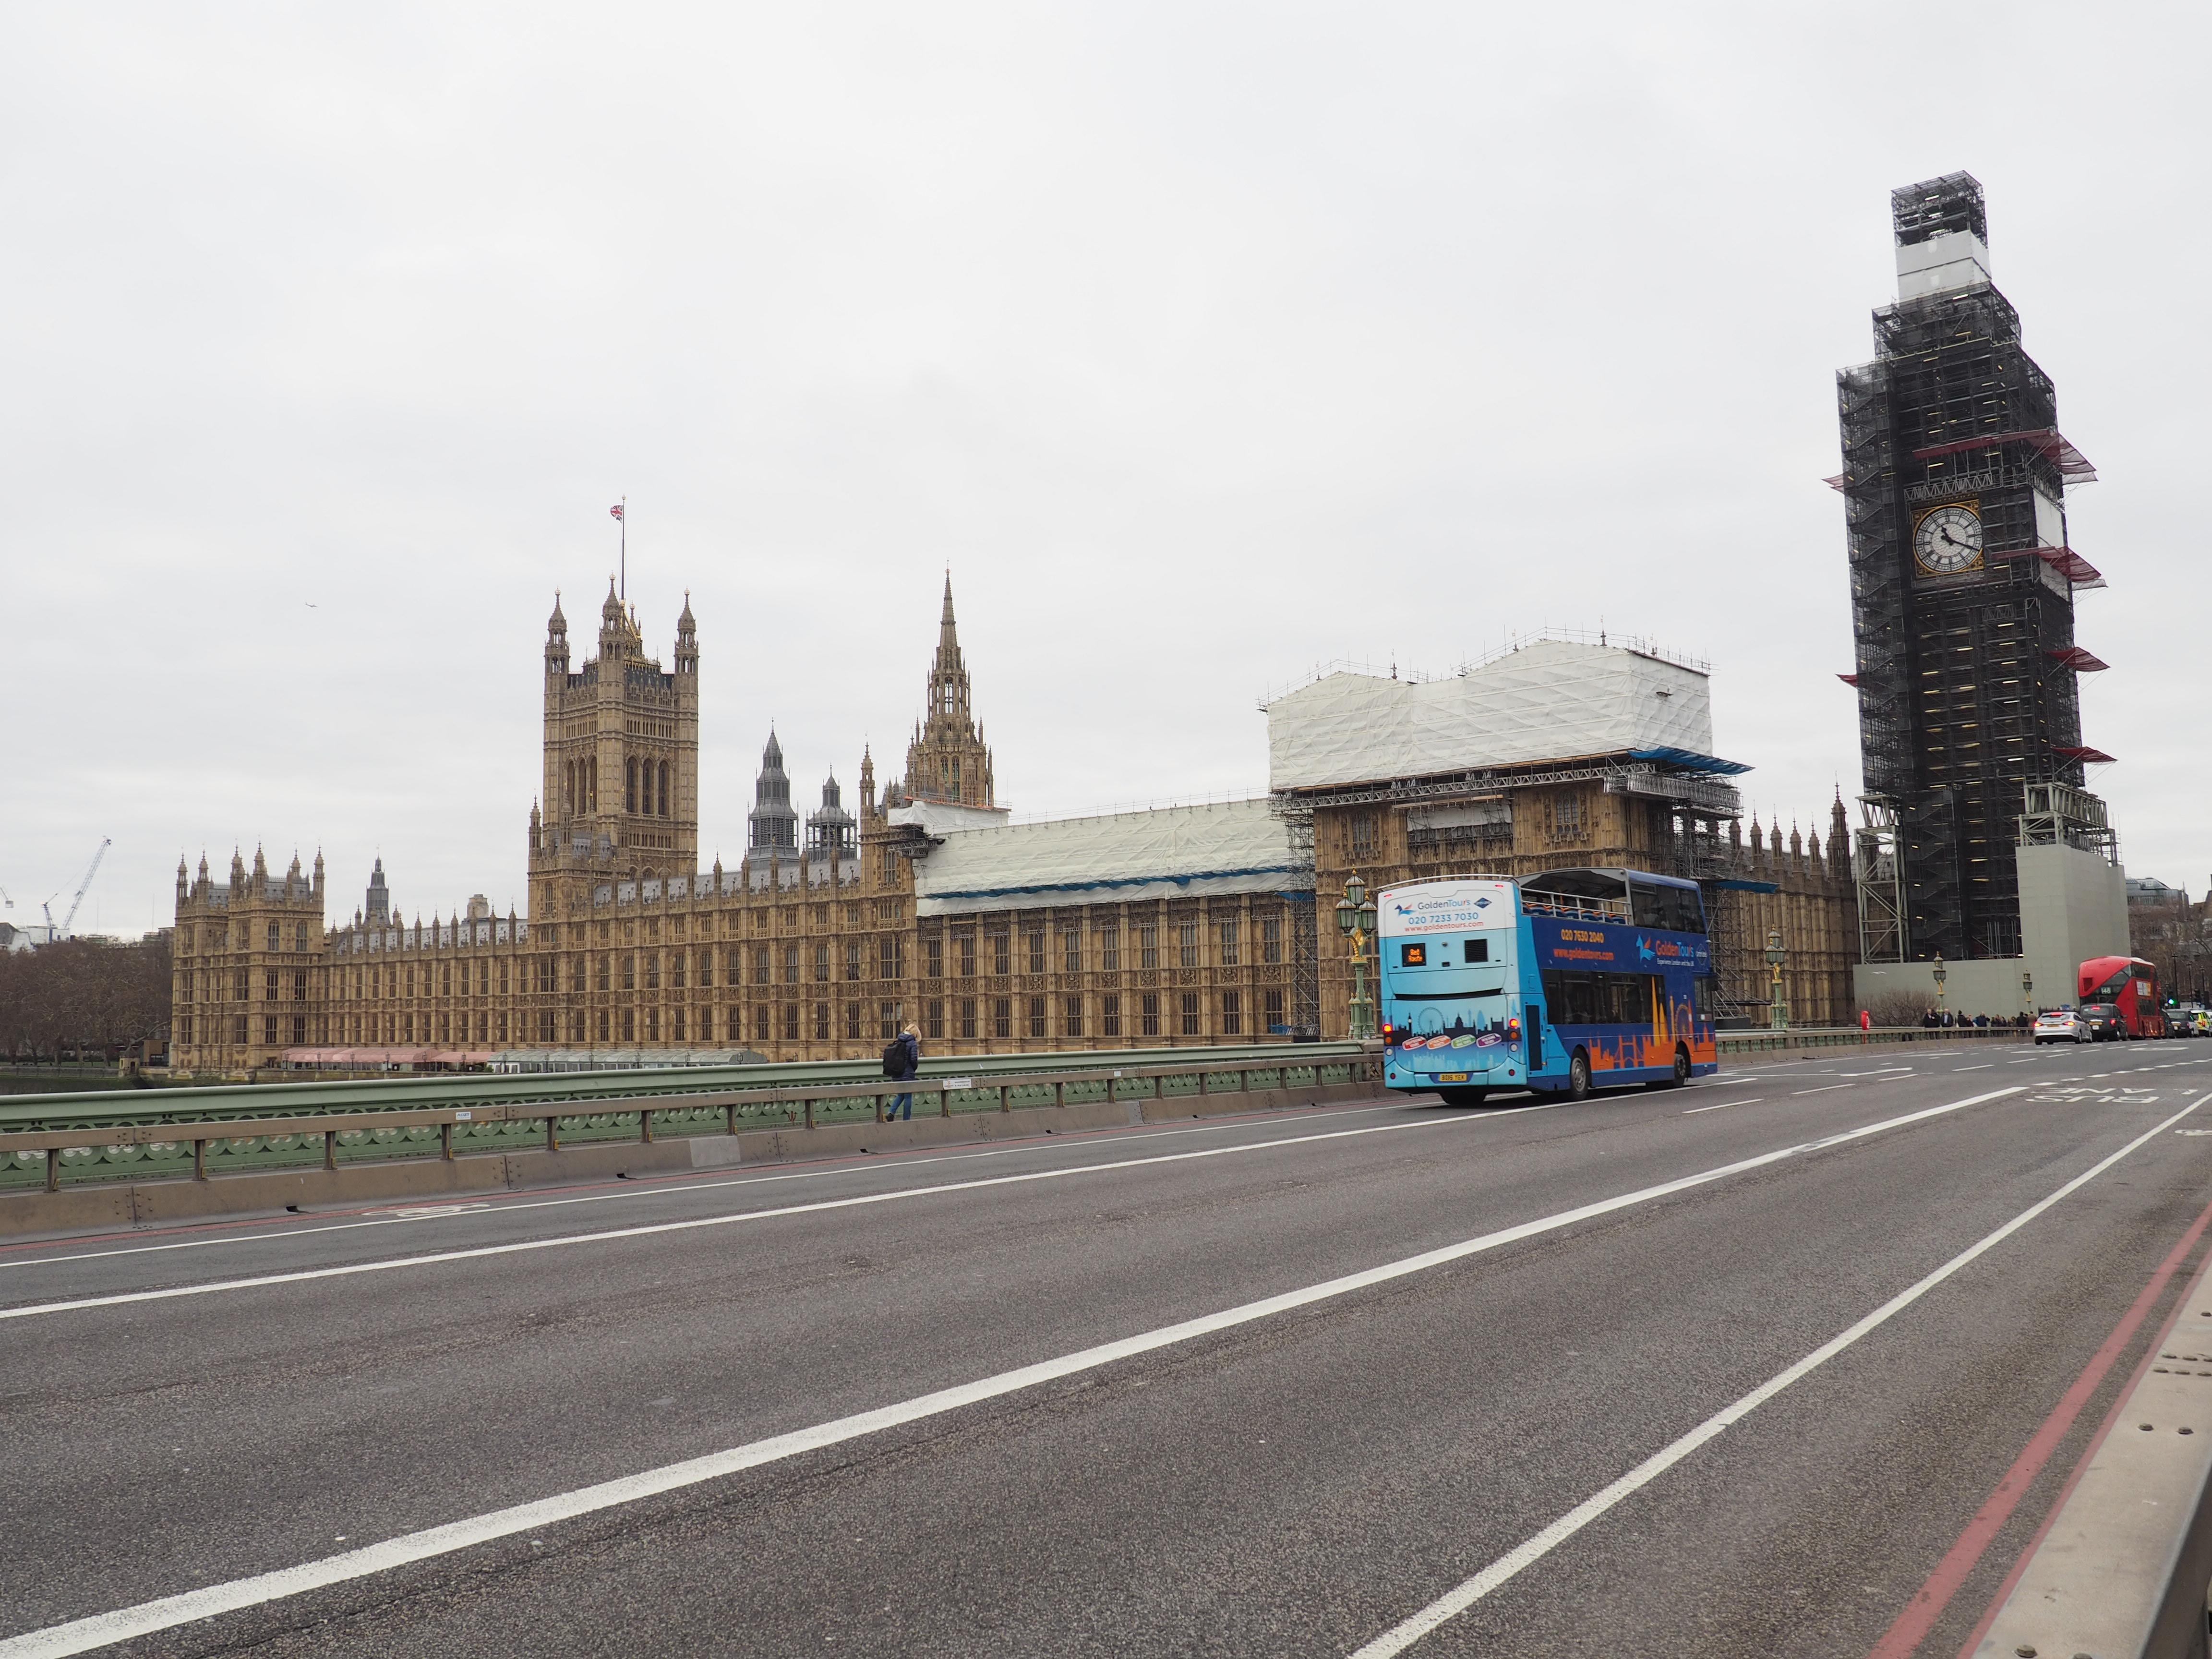 Palazzo del parlamento e Big Ben